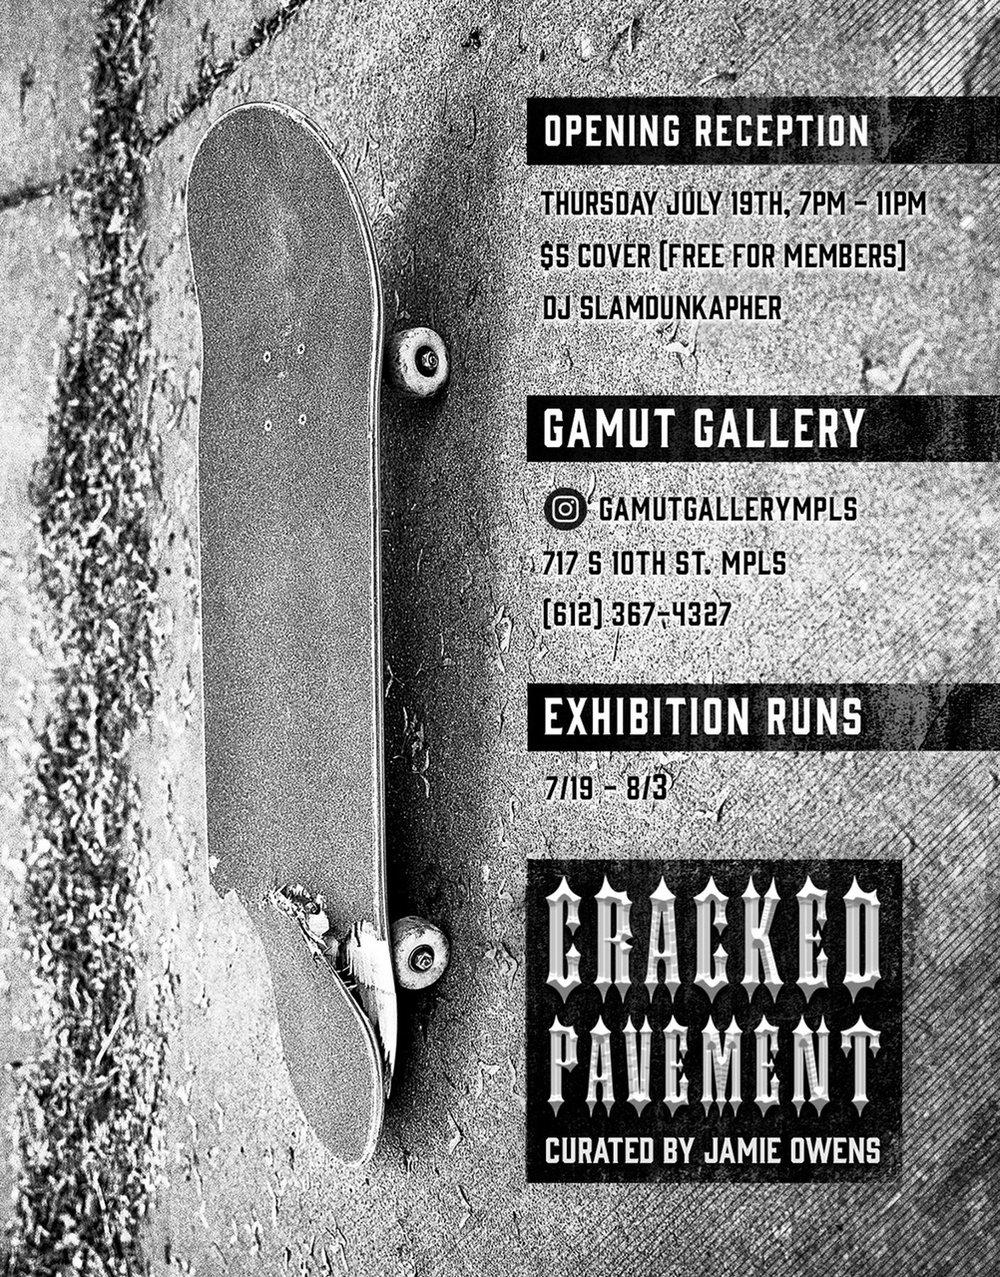 Cracked-Pavement_back.jpg